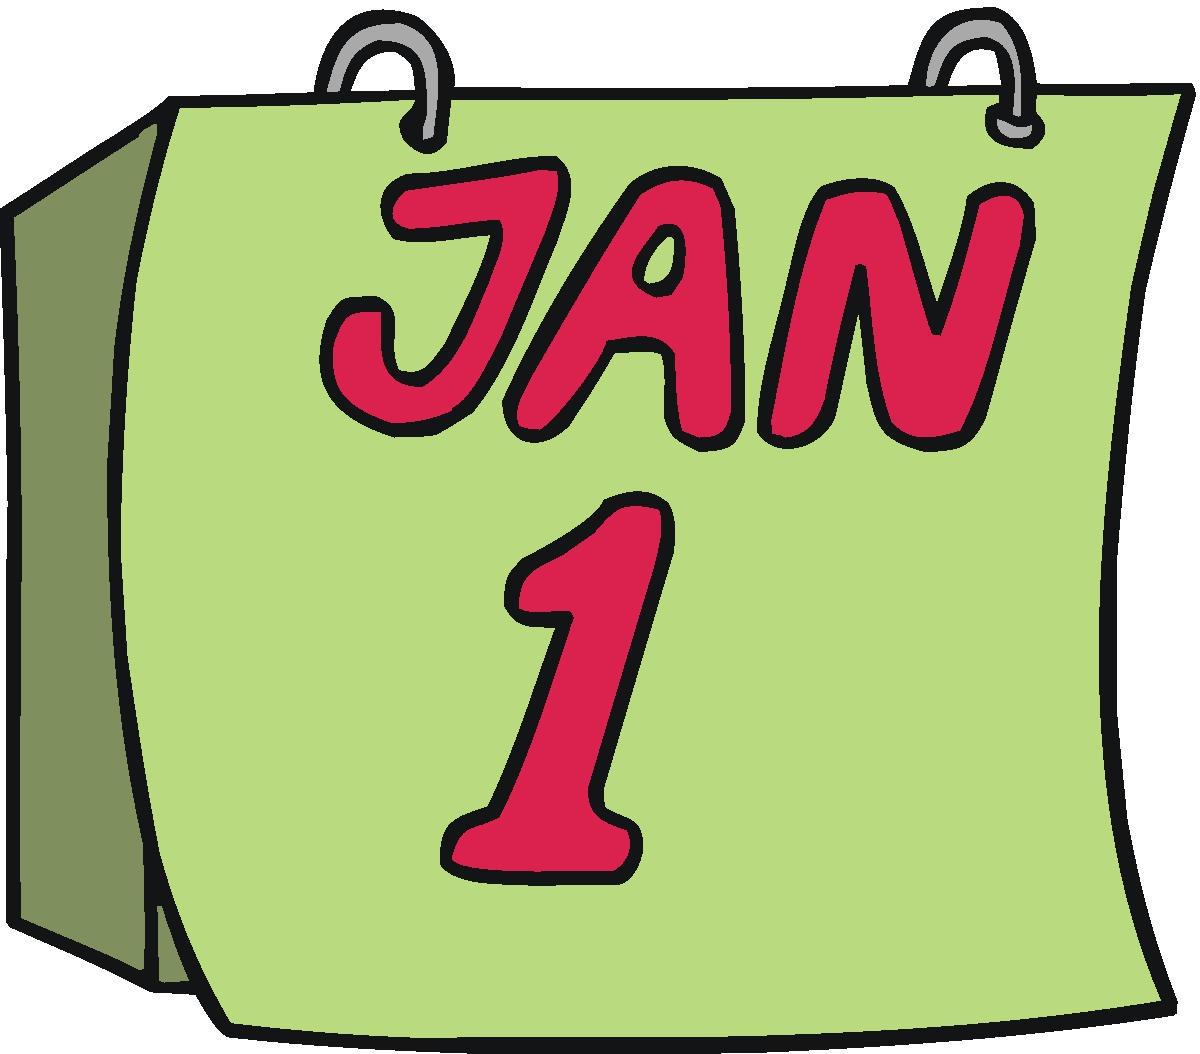 Mark Your Calendar Clipart - Cliparts.co